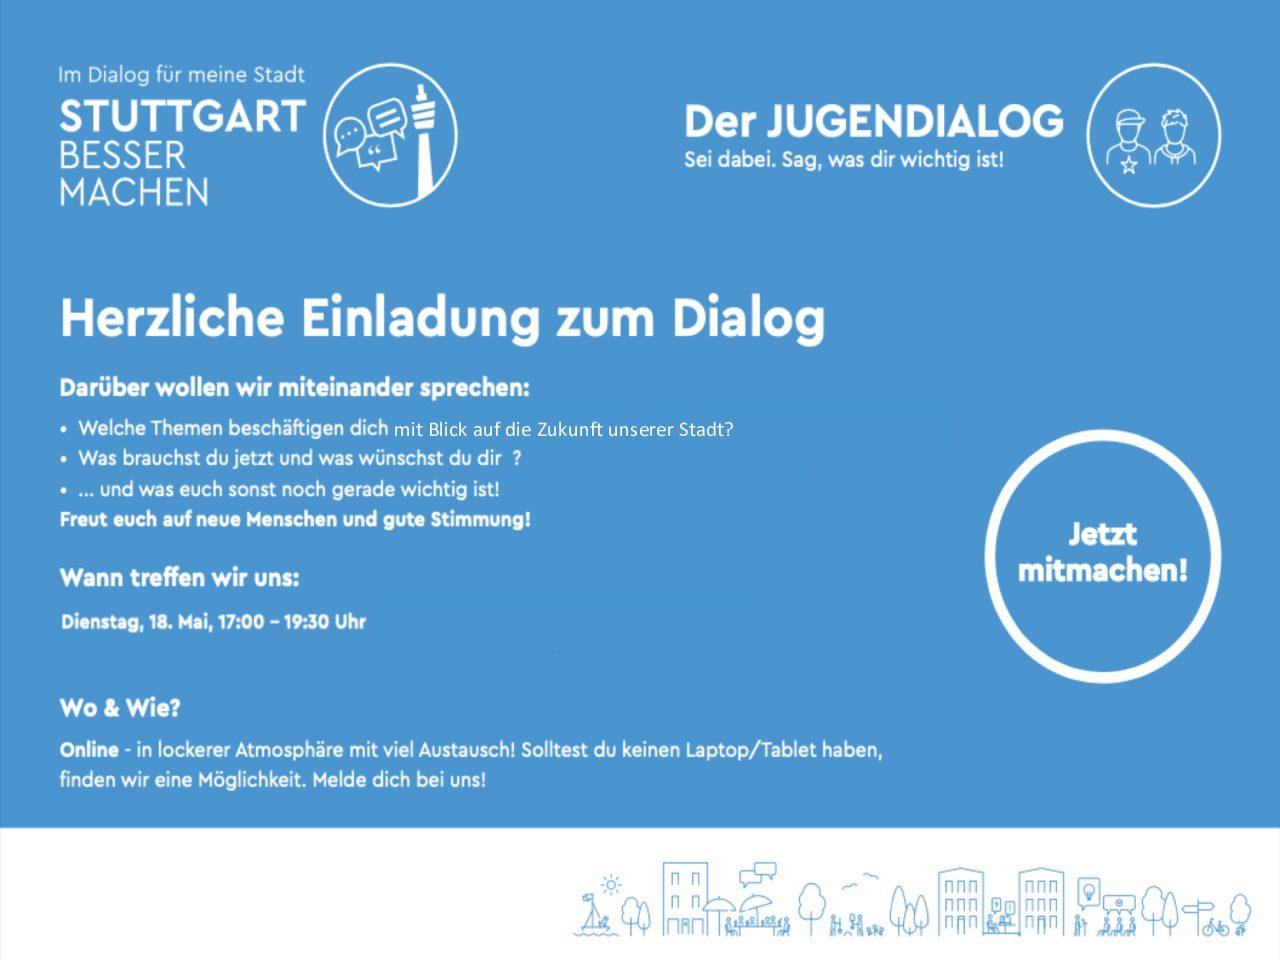 Jugenddialog: Online-Dialog am 18. Mai